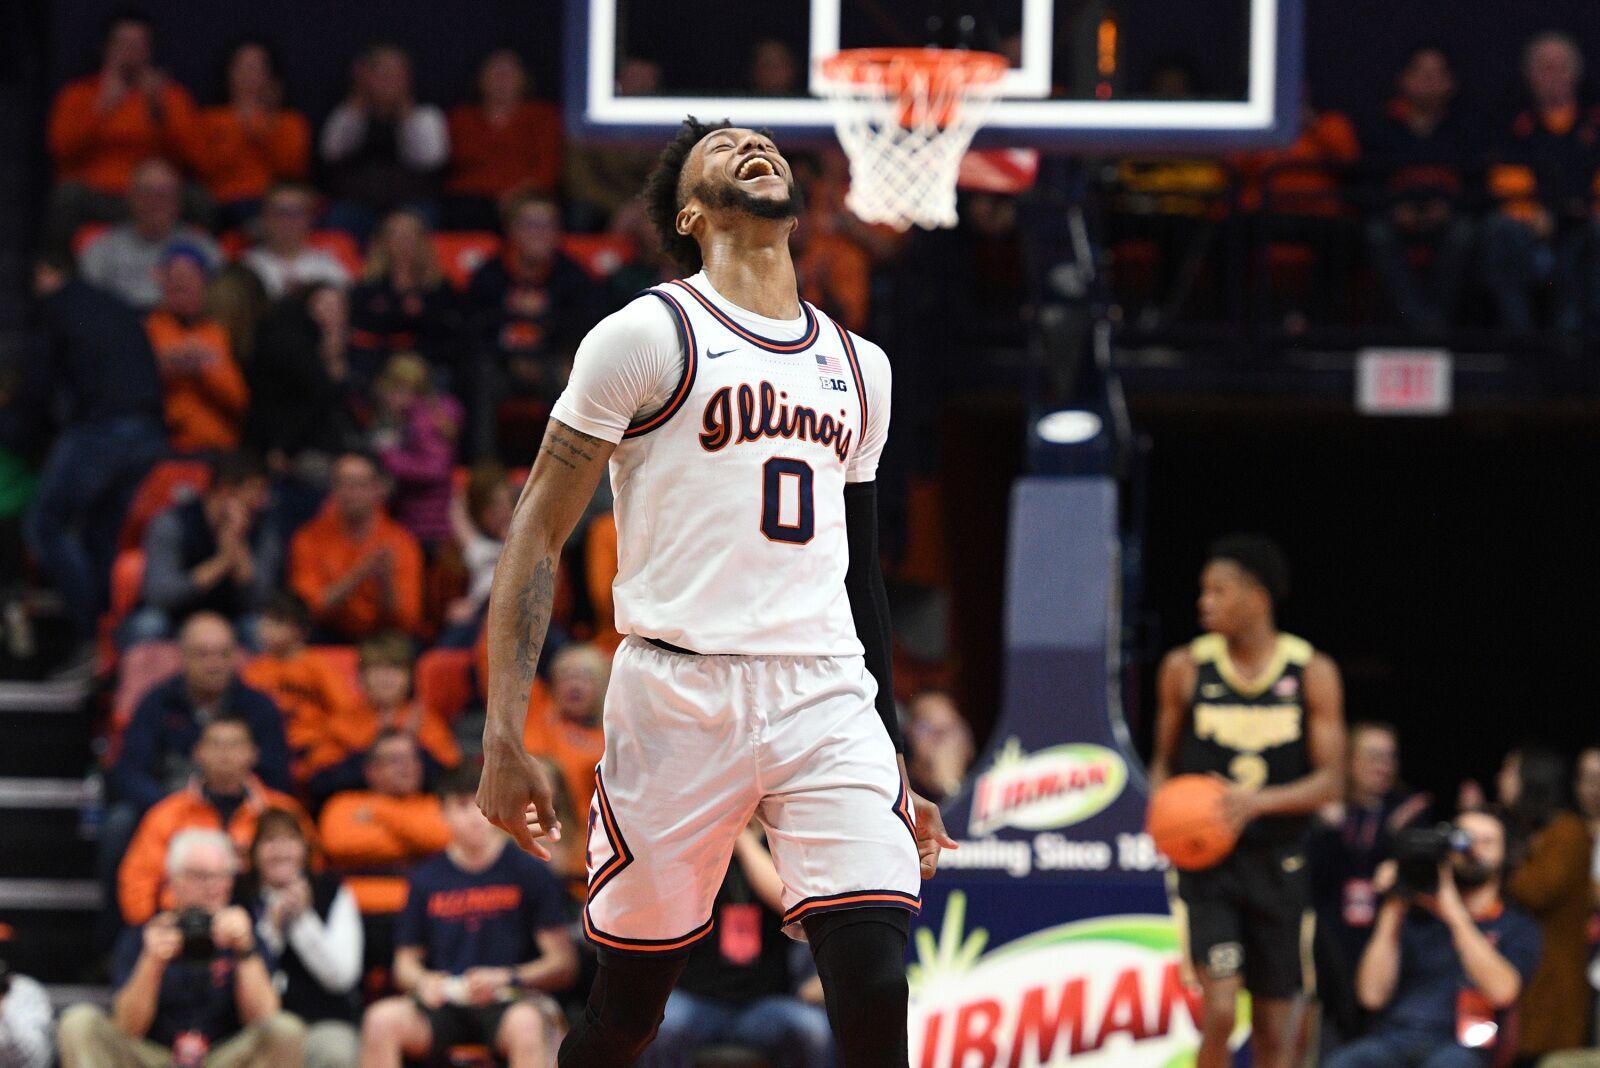 Illinois Basketball: Illini move up three spots in latest AP Top 25 rankings